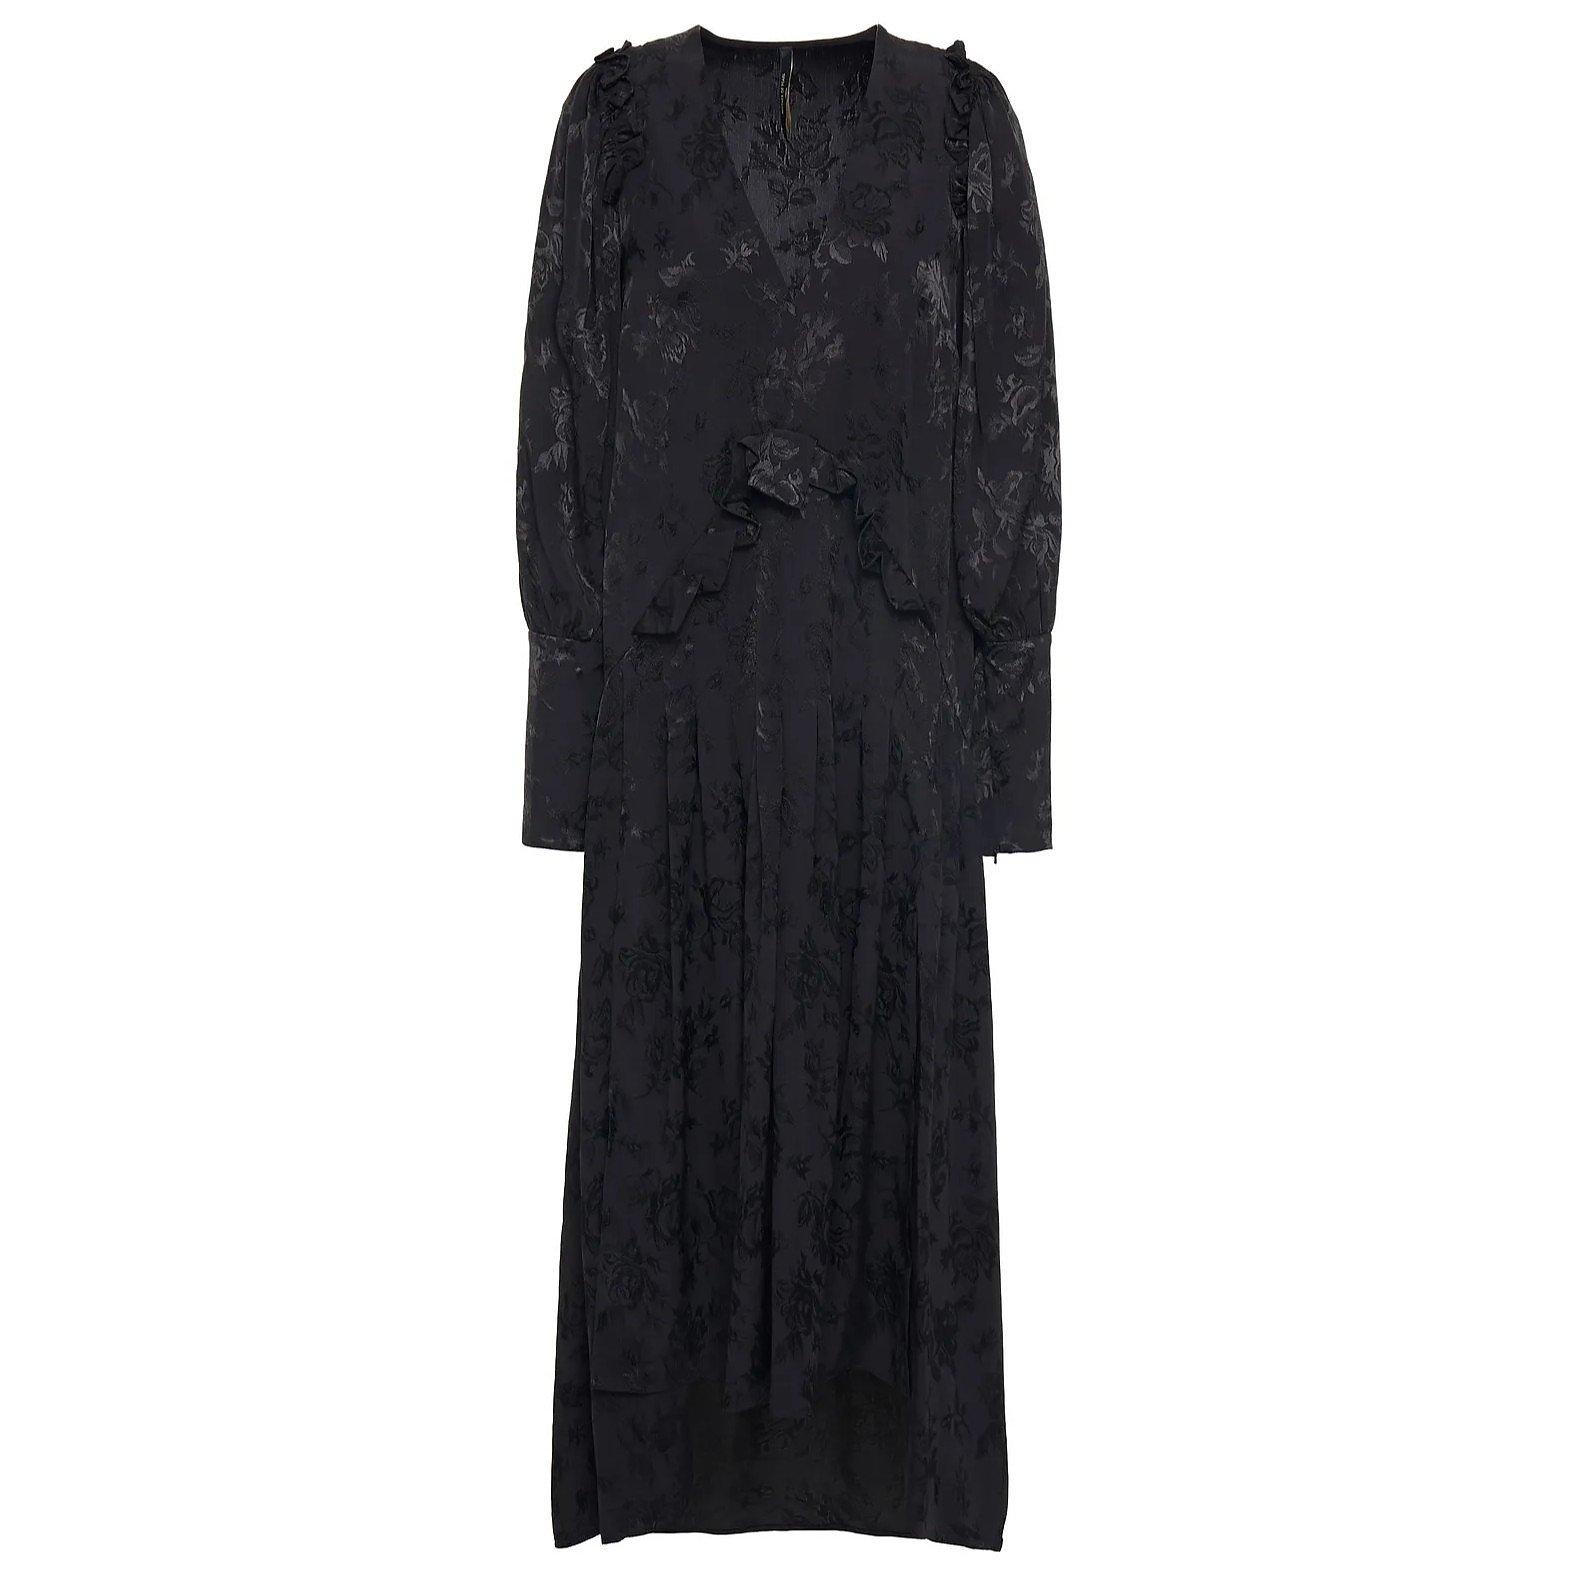 Mother of Pearl Ruffled Satin-Jacquard Midi Dress